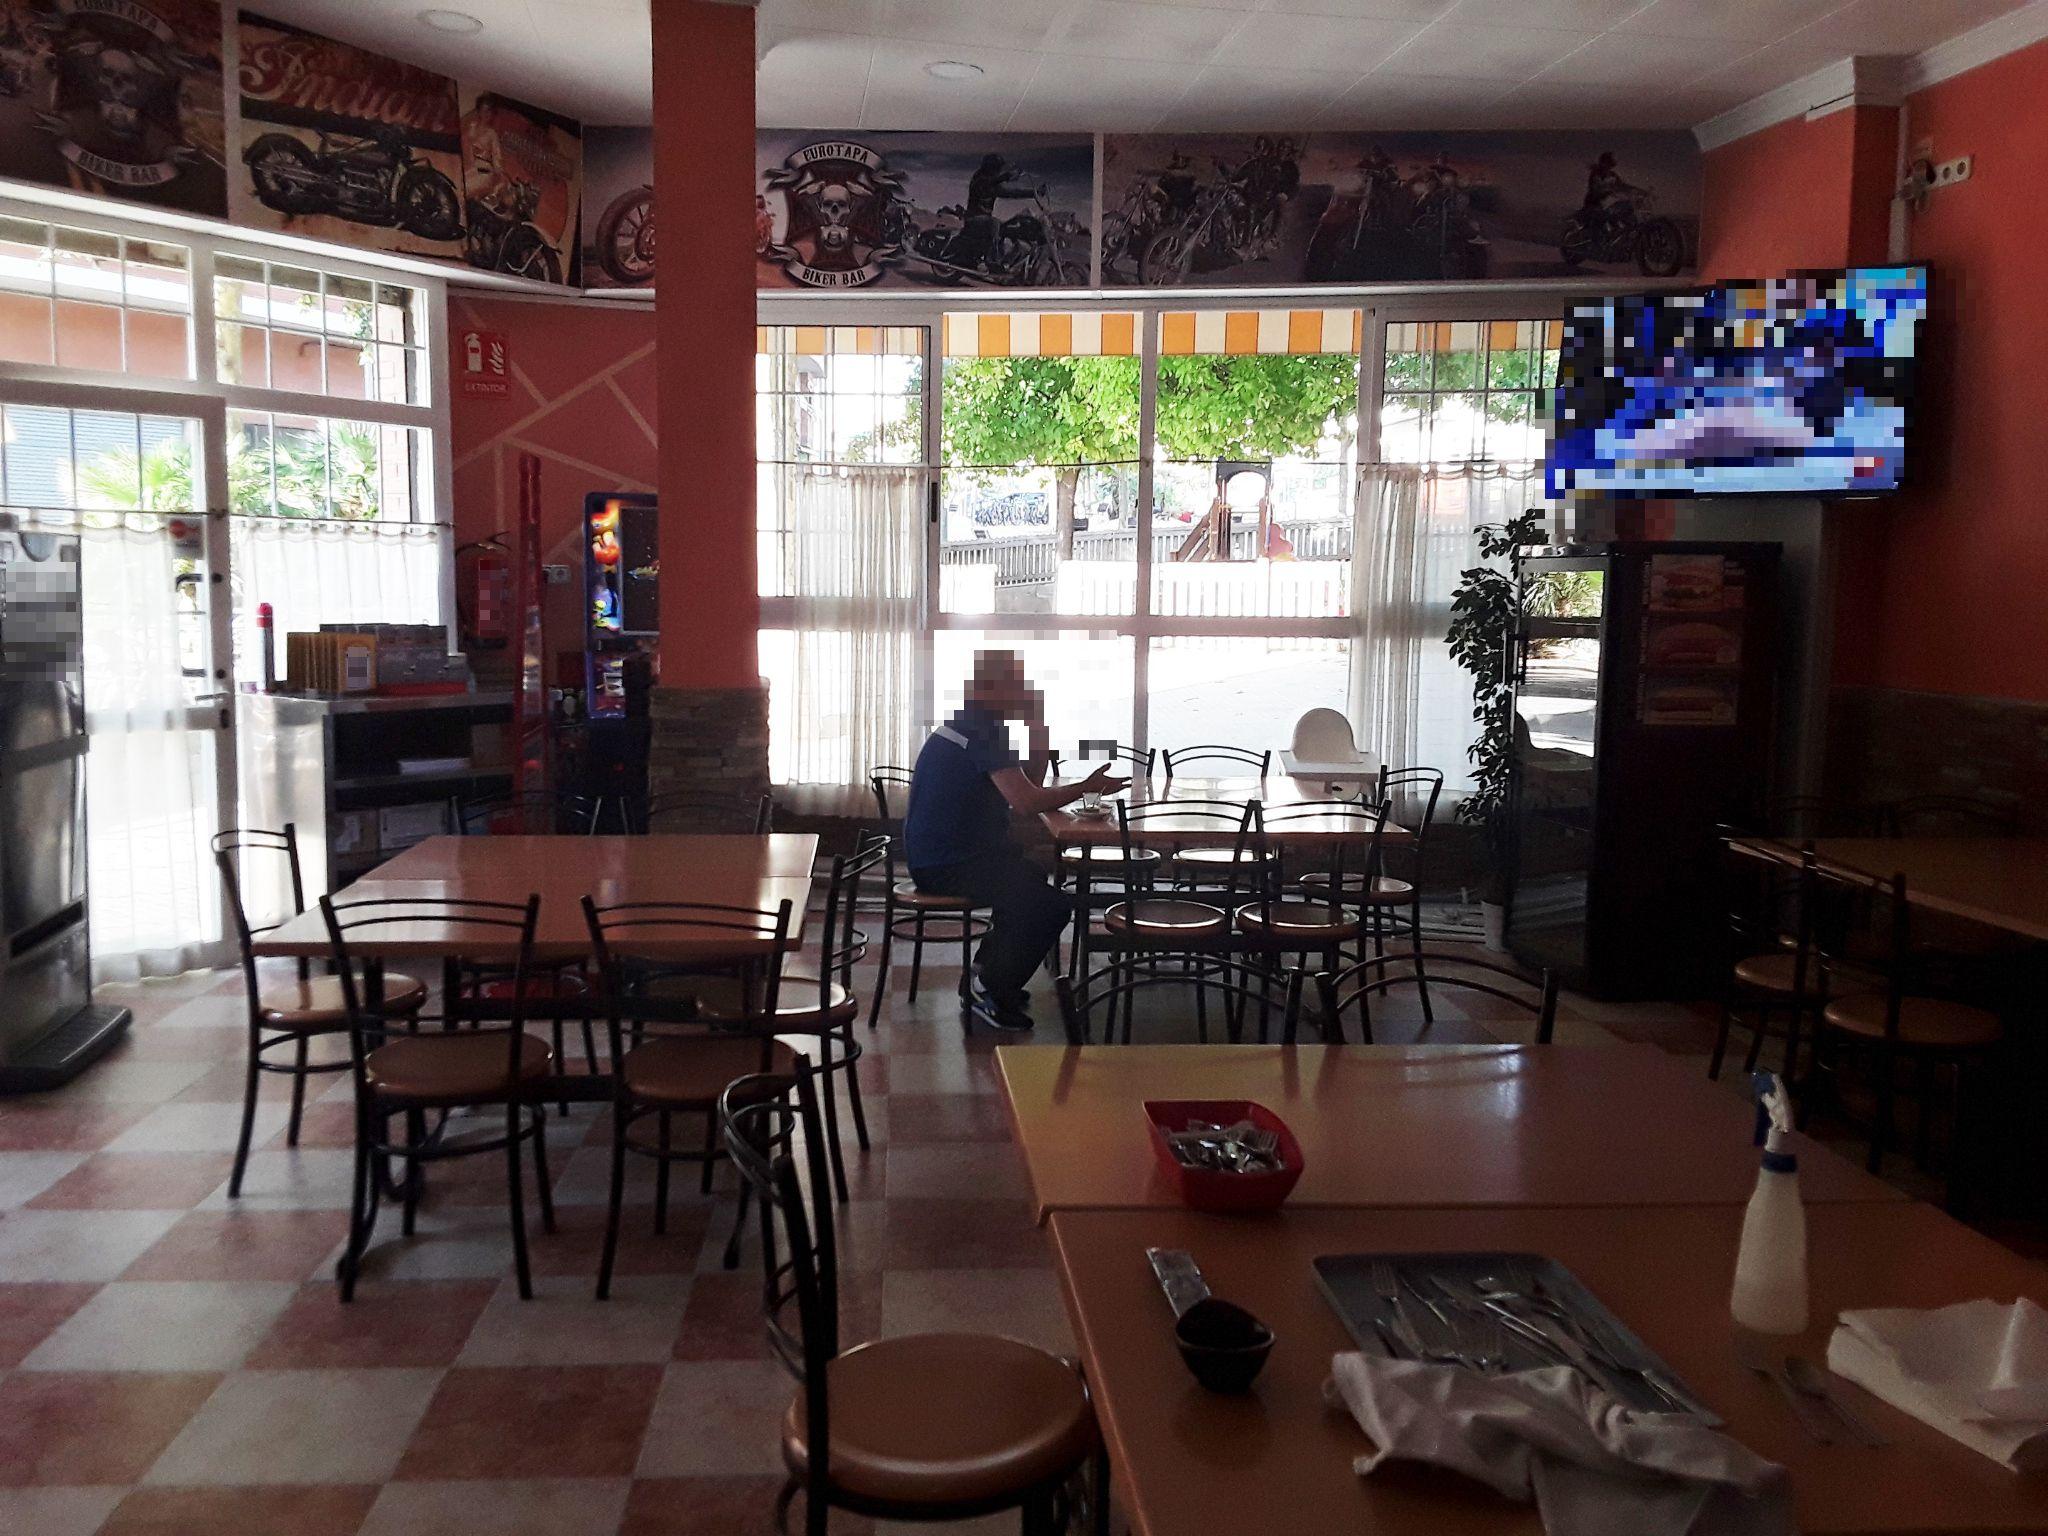 bar-bien-situado-en-alquiler-en-viladecans-barcelona-2